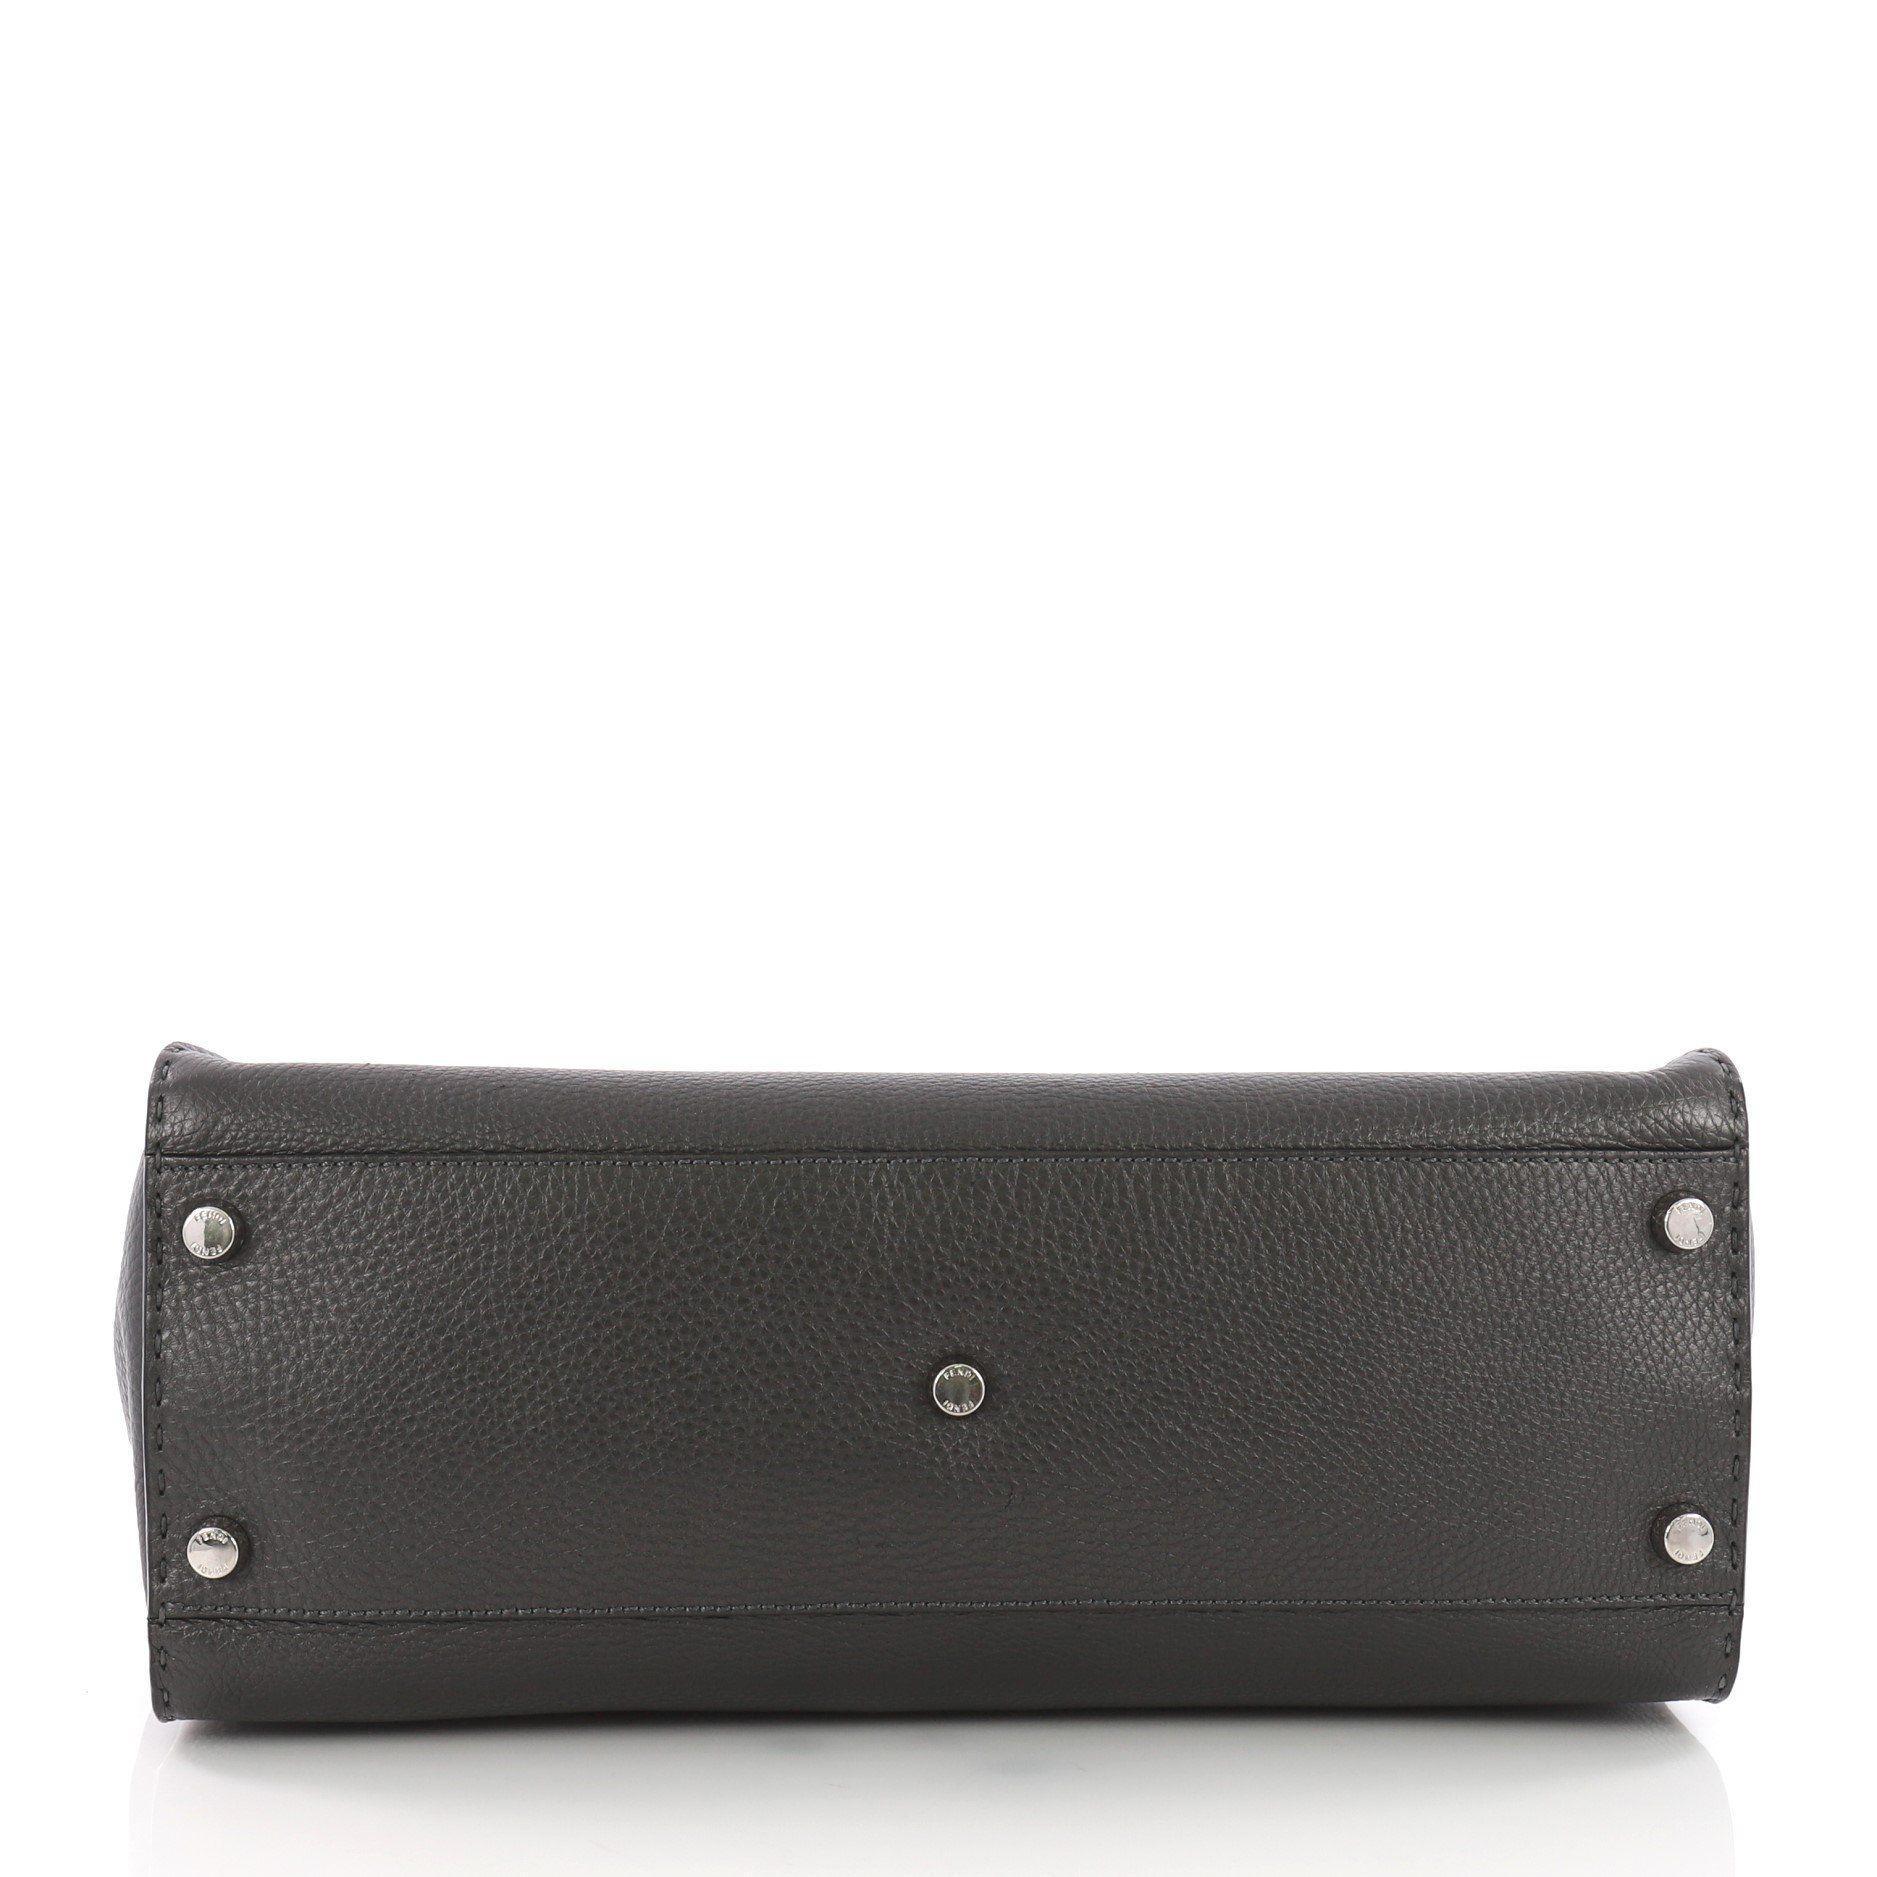 8a1b051730eb Fendi - Black Pre Owned Selleria Peekaboo Monster Handbag Leather Xl -  Lyst. View fullscreen